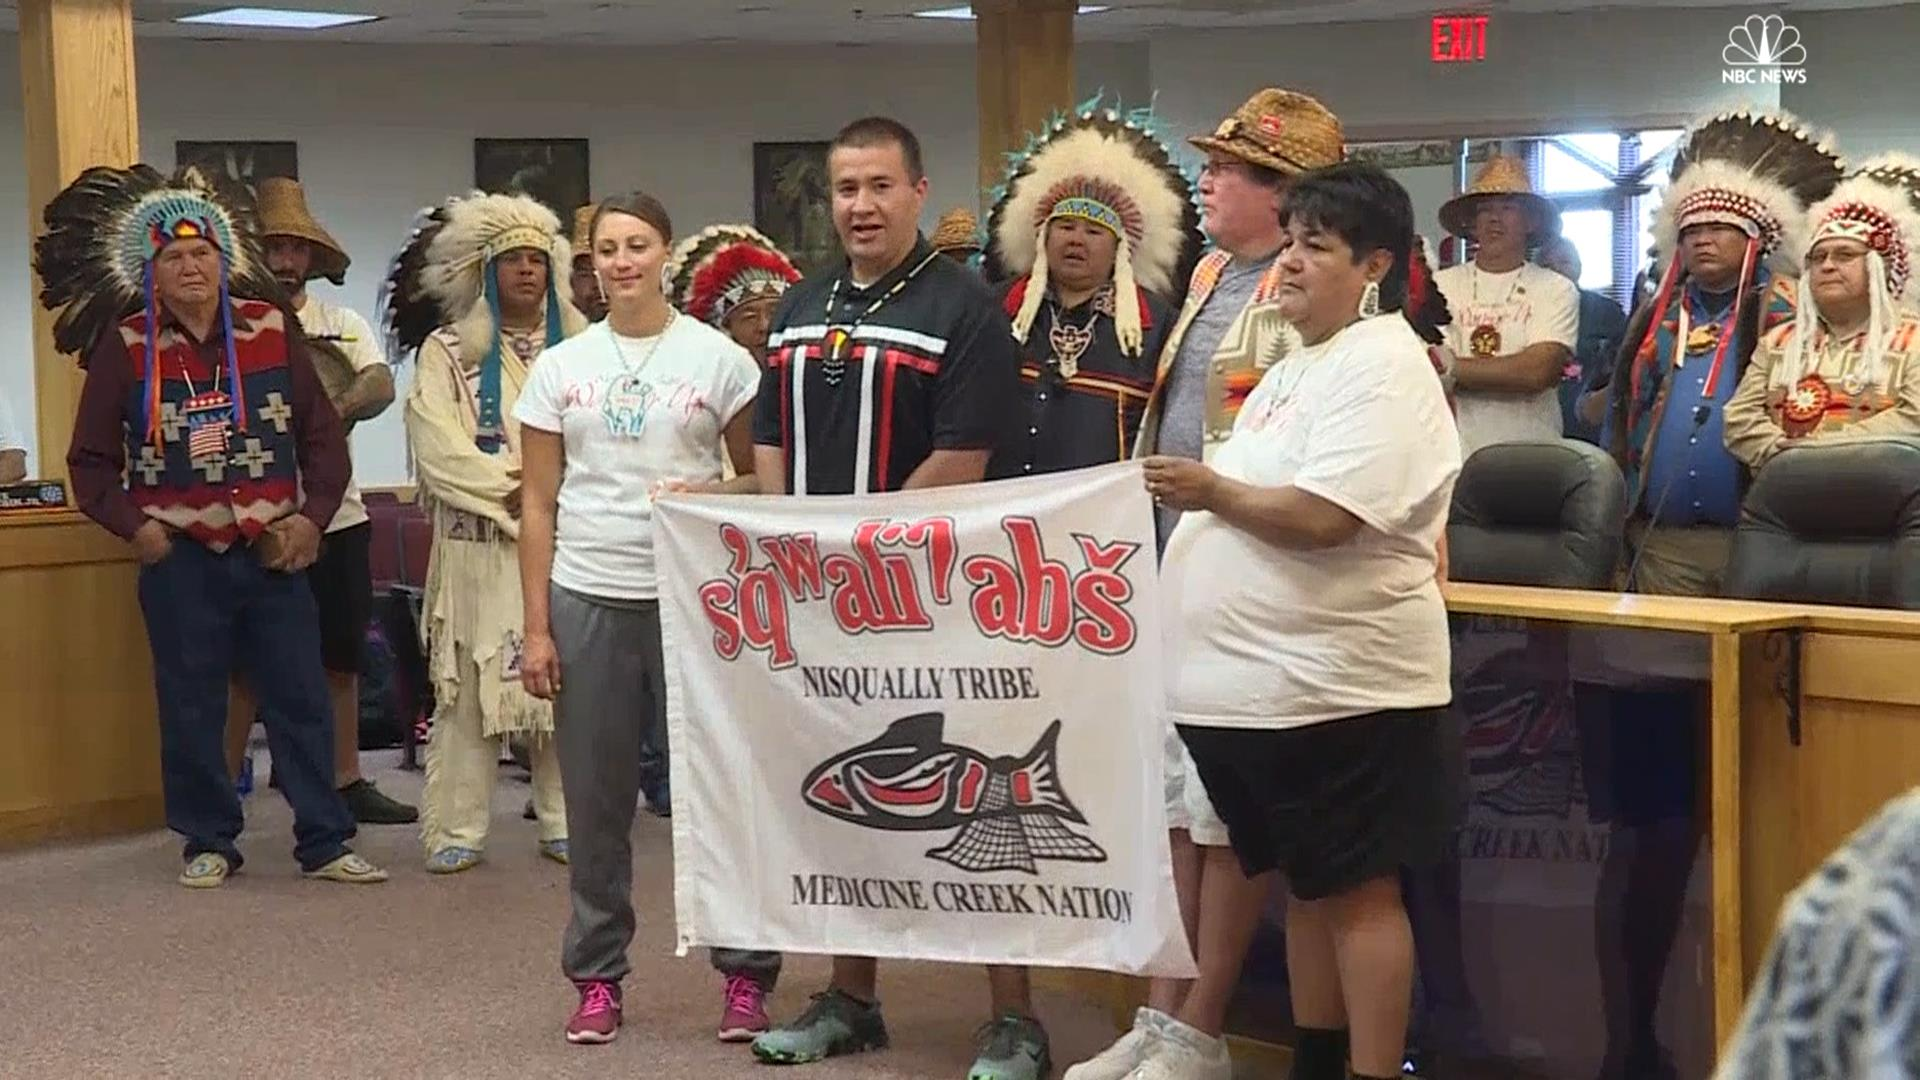 Oil Pipeline Protest Turns Violent in North Dakota